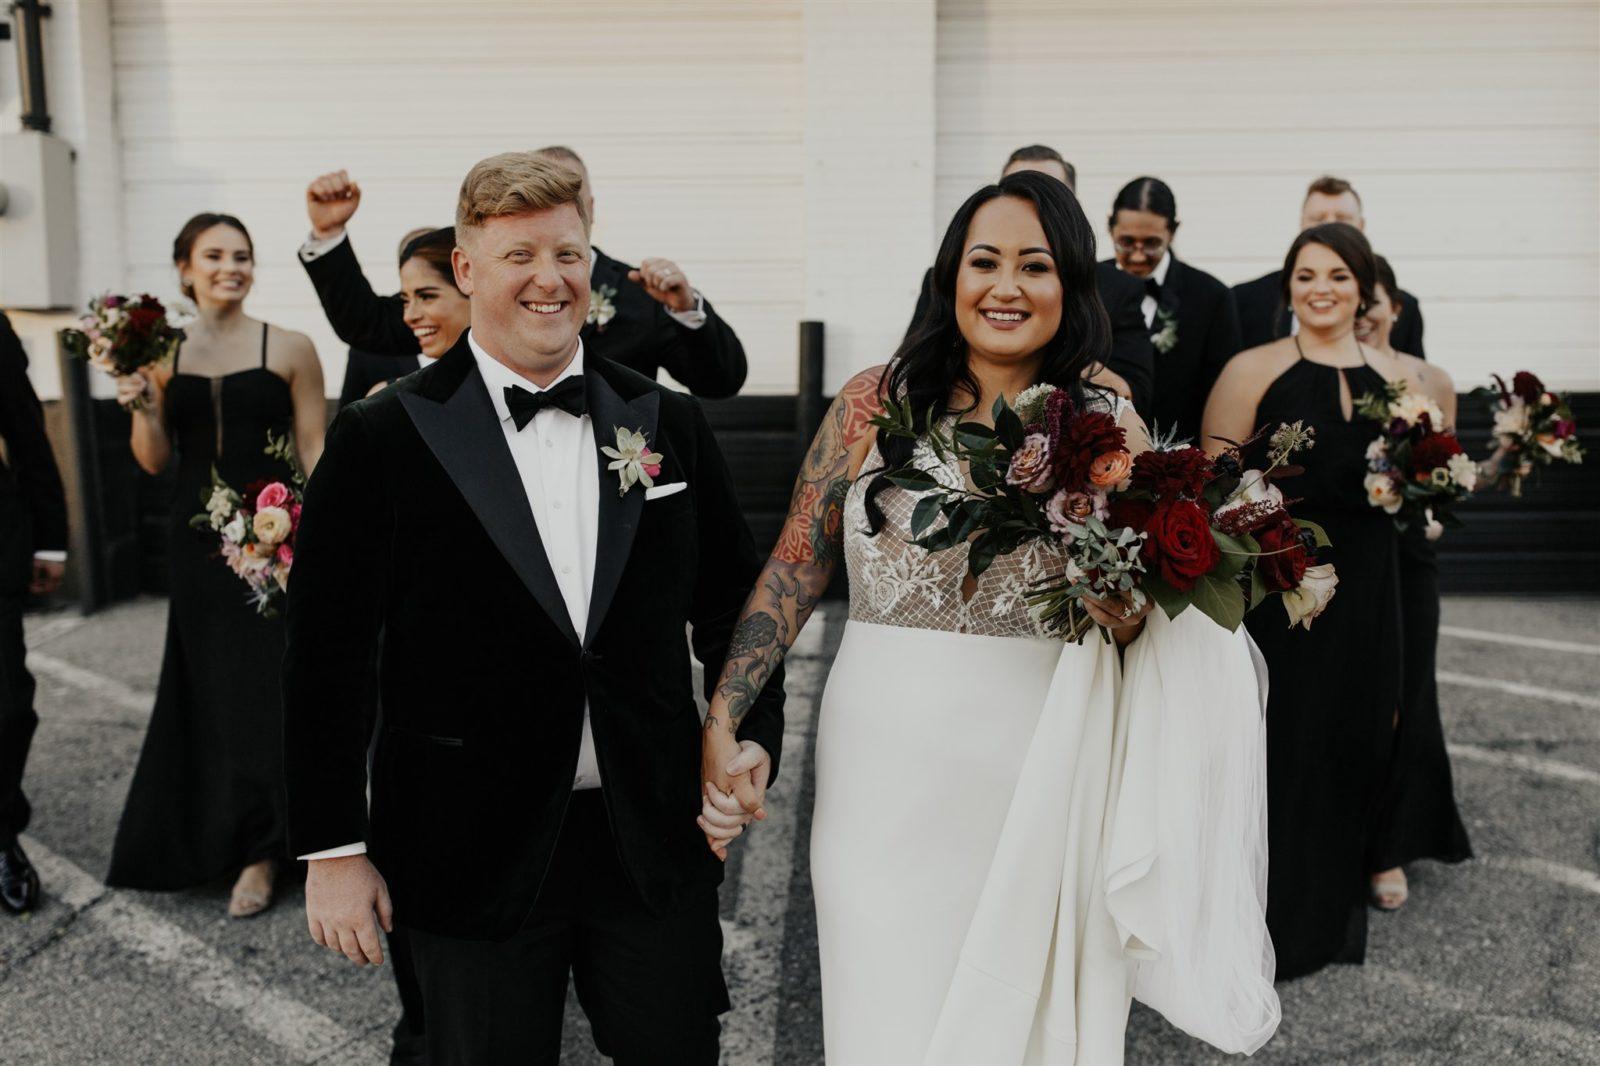 Madeline Shea Wedding Photography featured on Alexa Kay Events